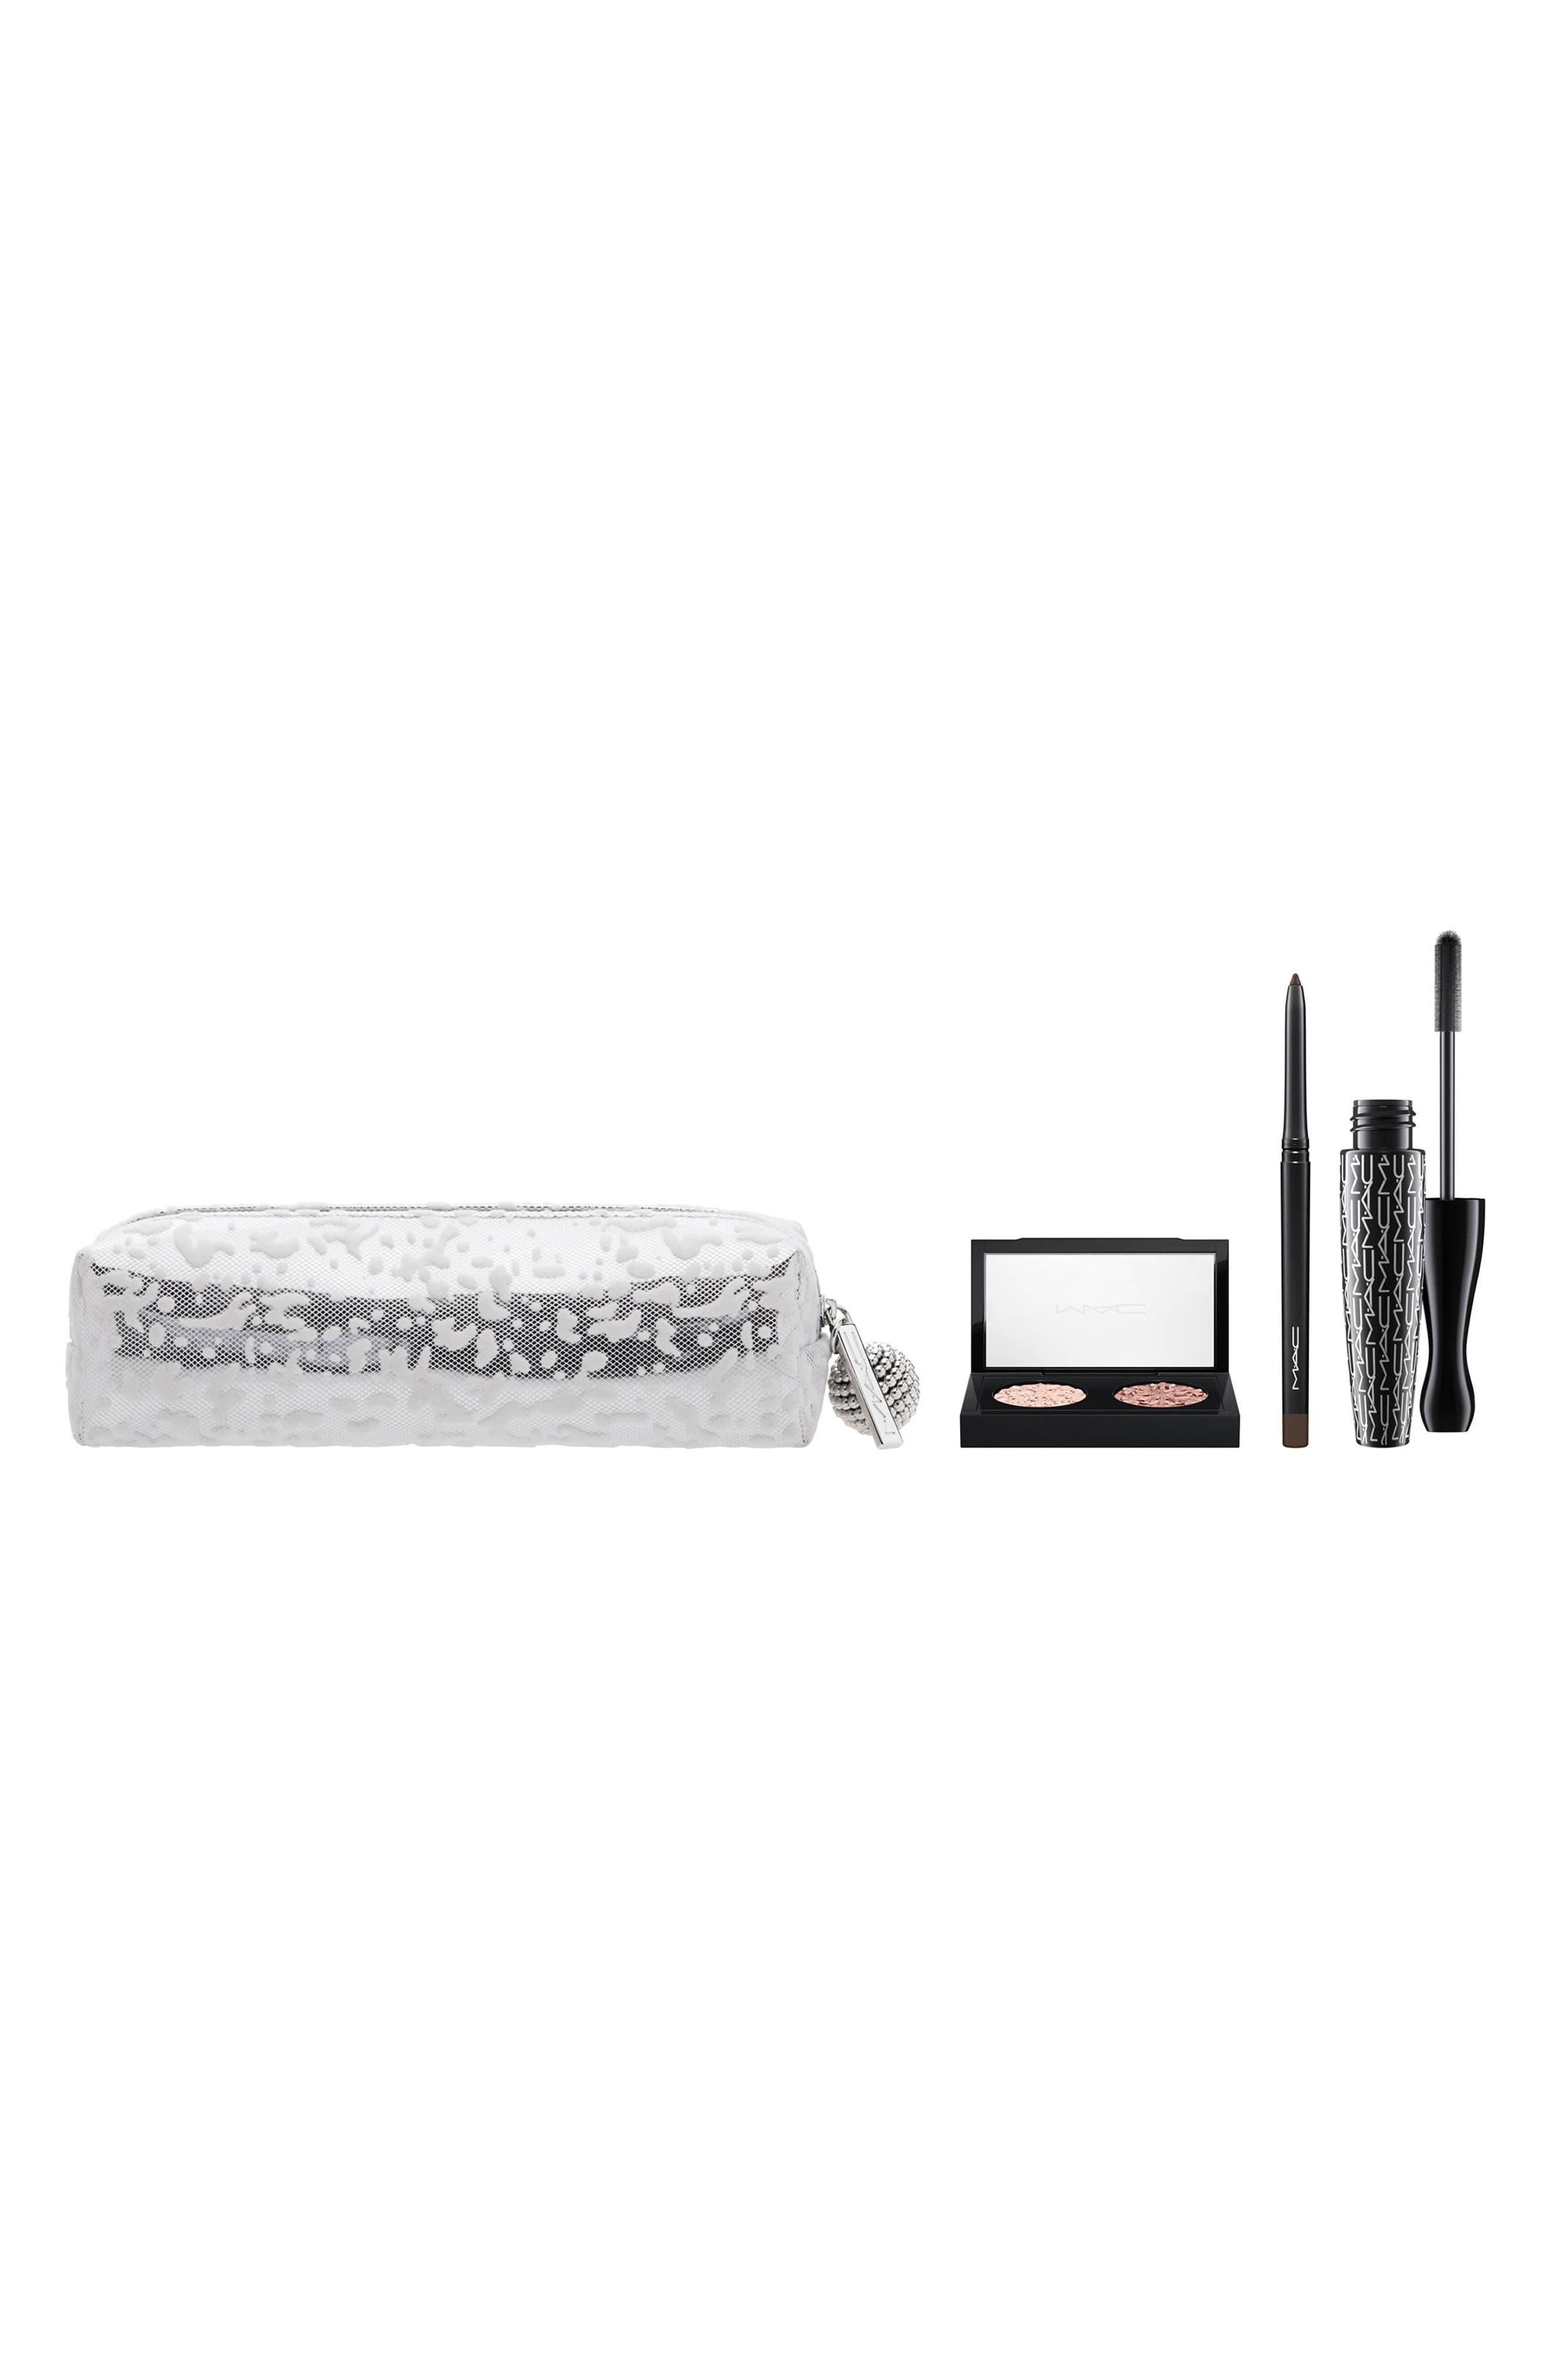 Main Image - MAC Snow Ball Smoky Gold Eye Bag ($72.50 Value)